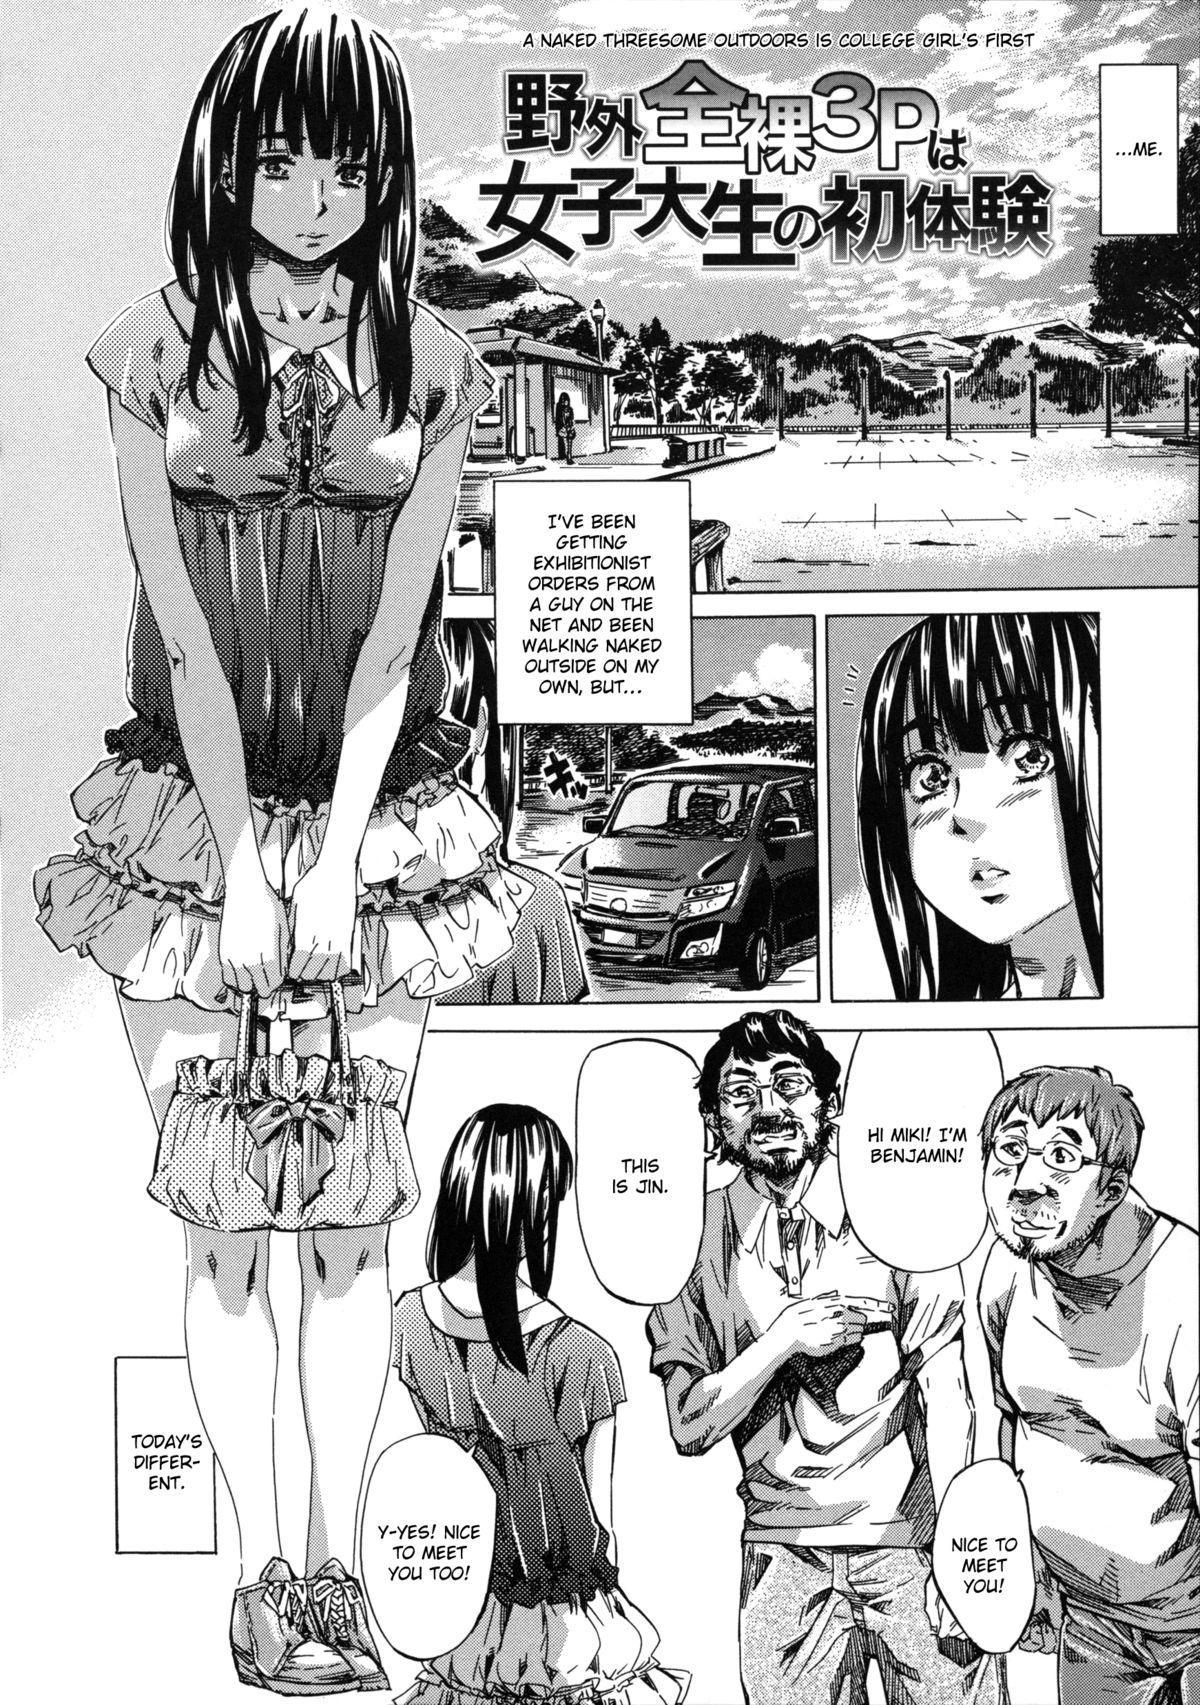 Kashiwazaki Miki wa Ironna Basho de Zenra Sanpo Shitemita | Miki Kashiwazaki Goes Naked in All Sorts of Places 152